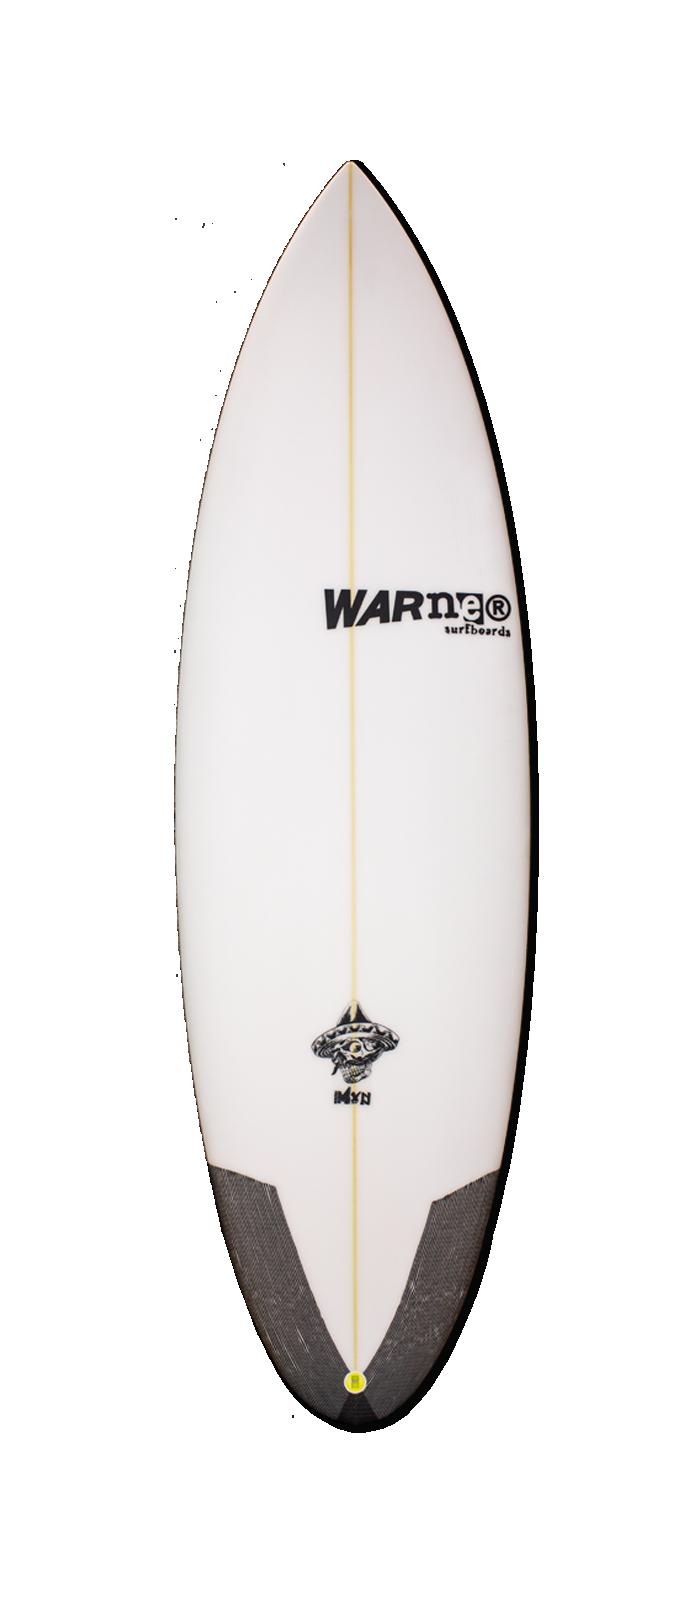 MEXICAN surfboard model